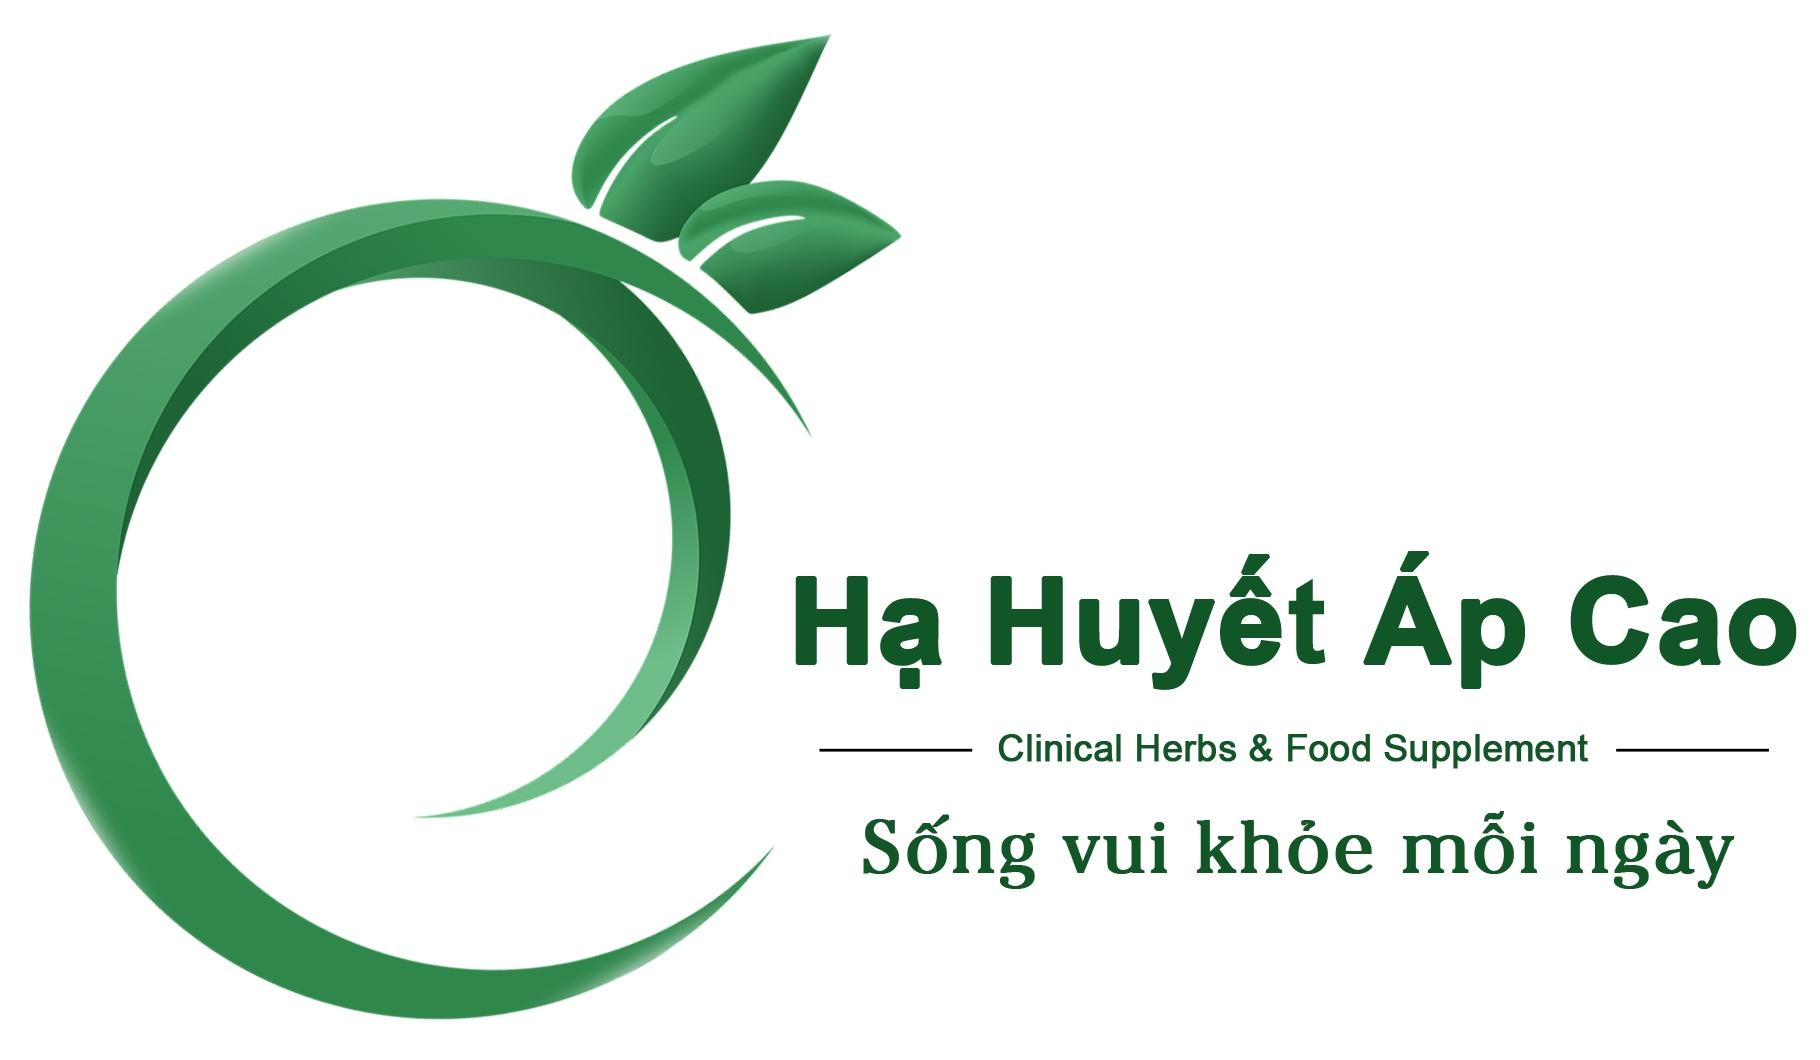 Wiki Huyết Áp Cao - Hahuyetapcao.com (@wikicaohuyetap) Cover Image